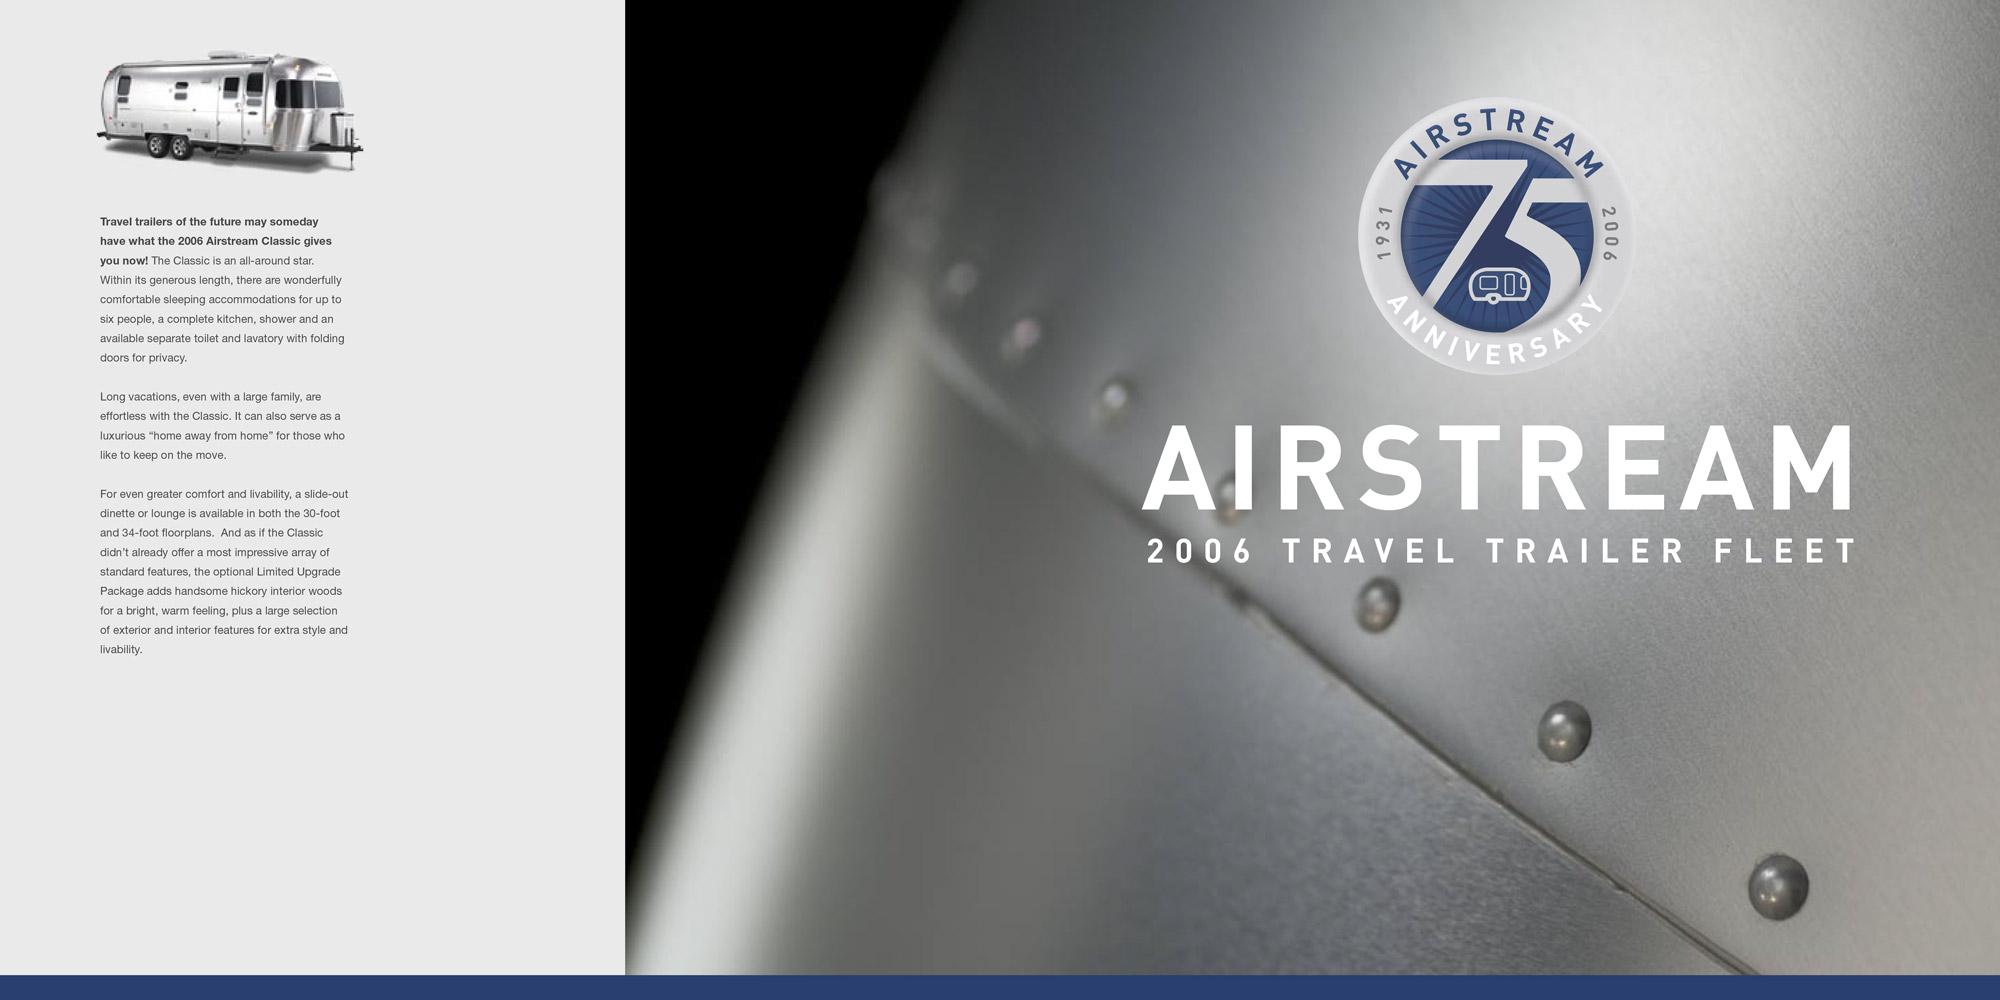 Airstream_2006_TT_Brochure_07-1a.jpg